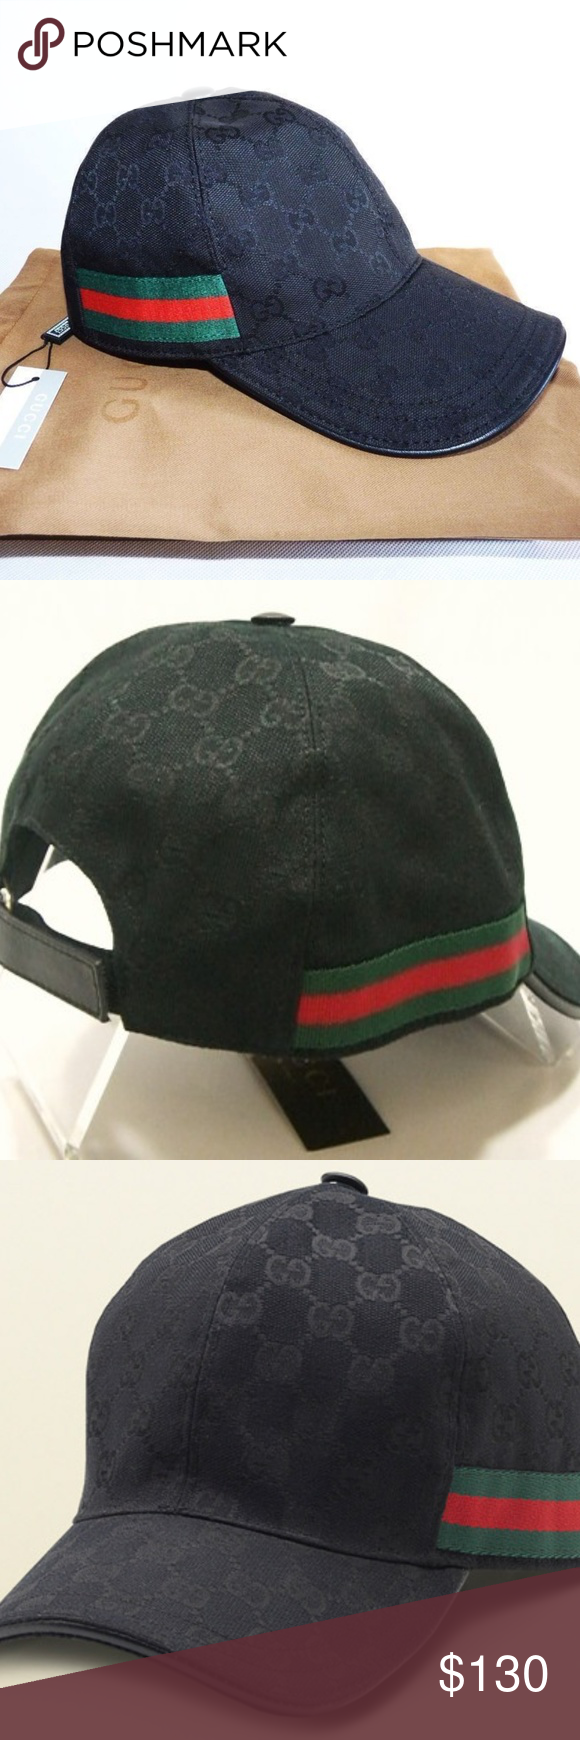 4074757fa2d04 GUCCI HAT Black